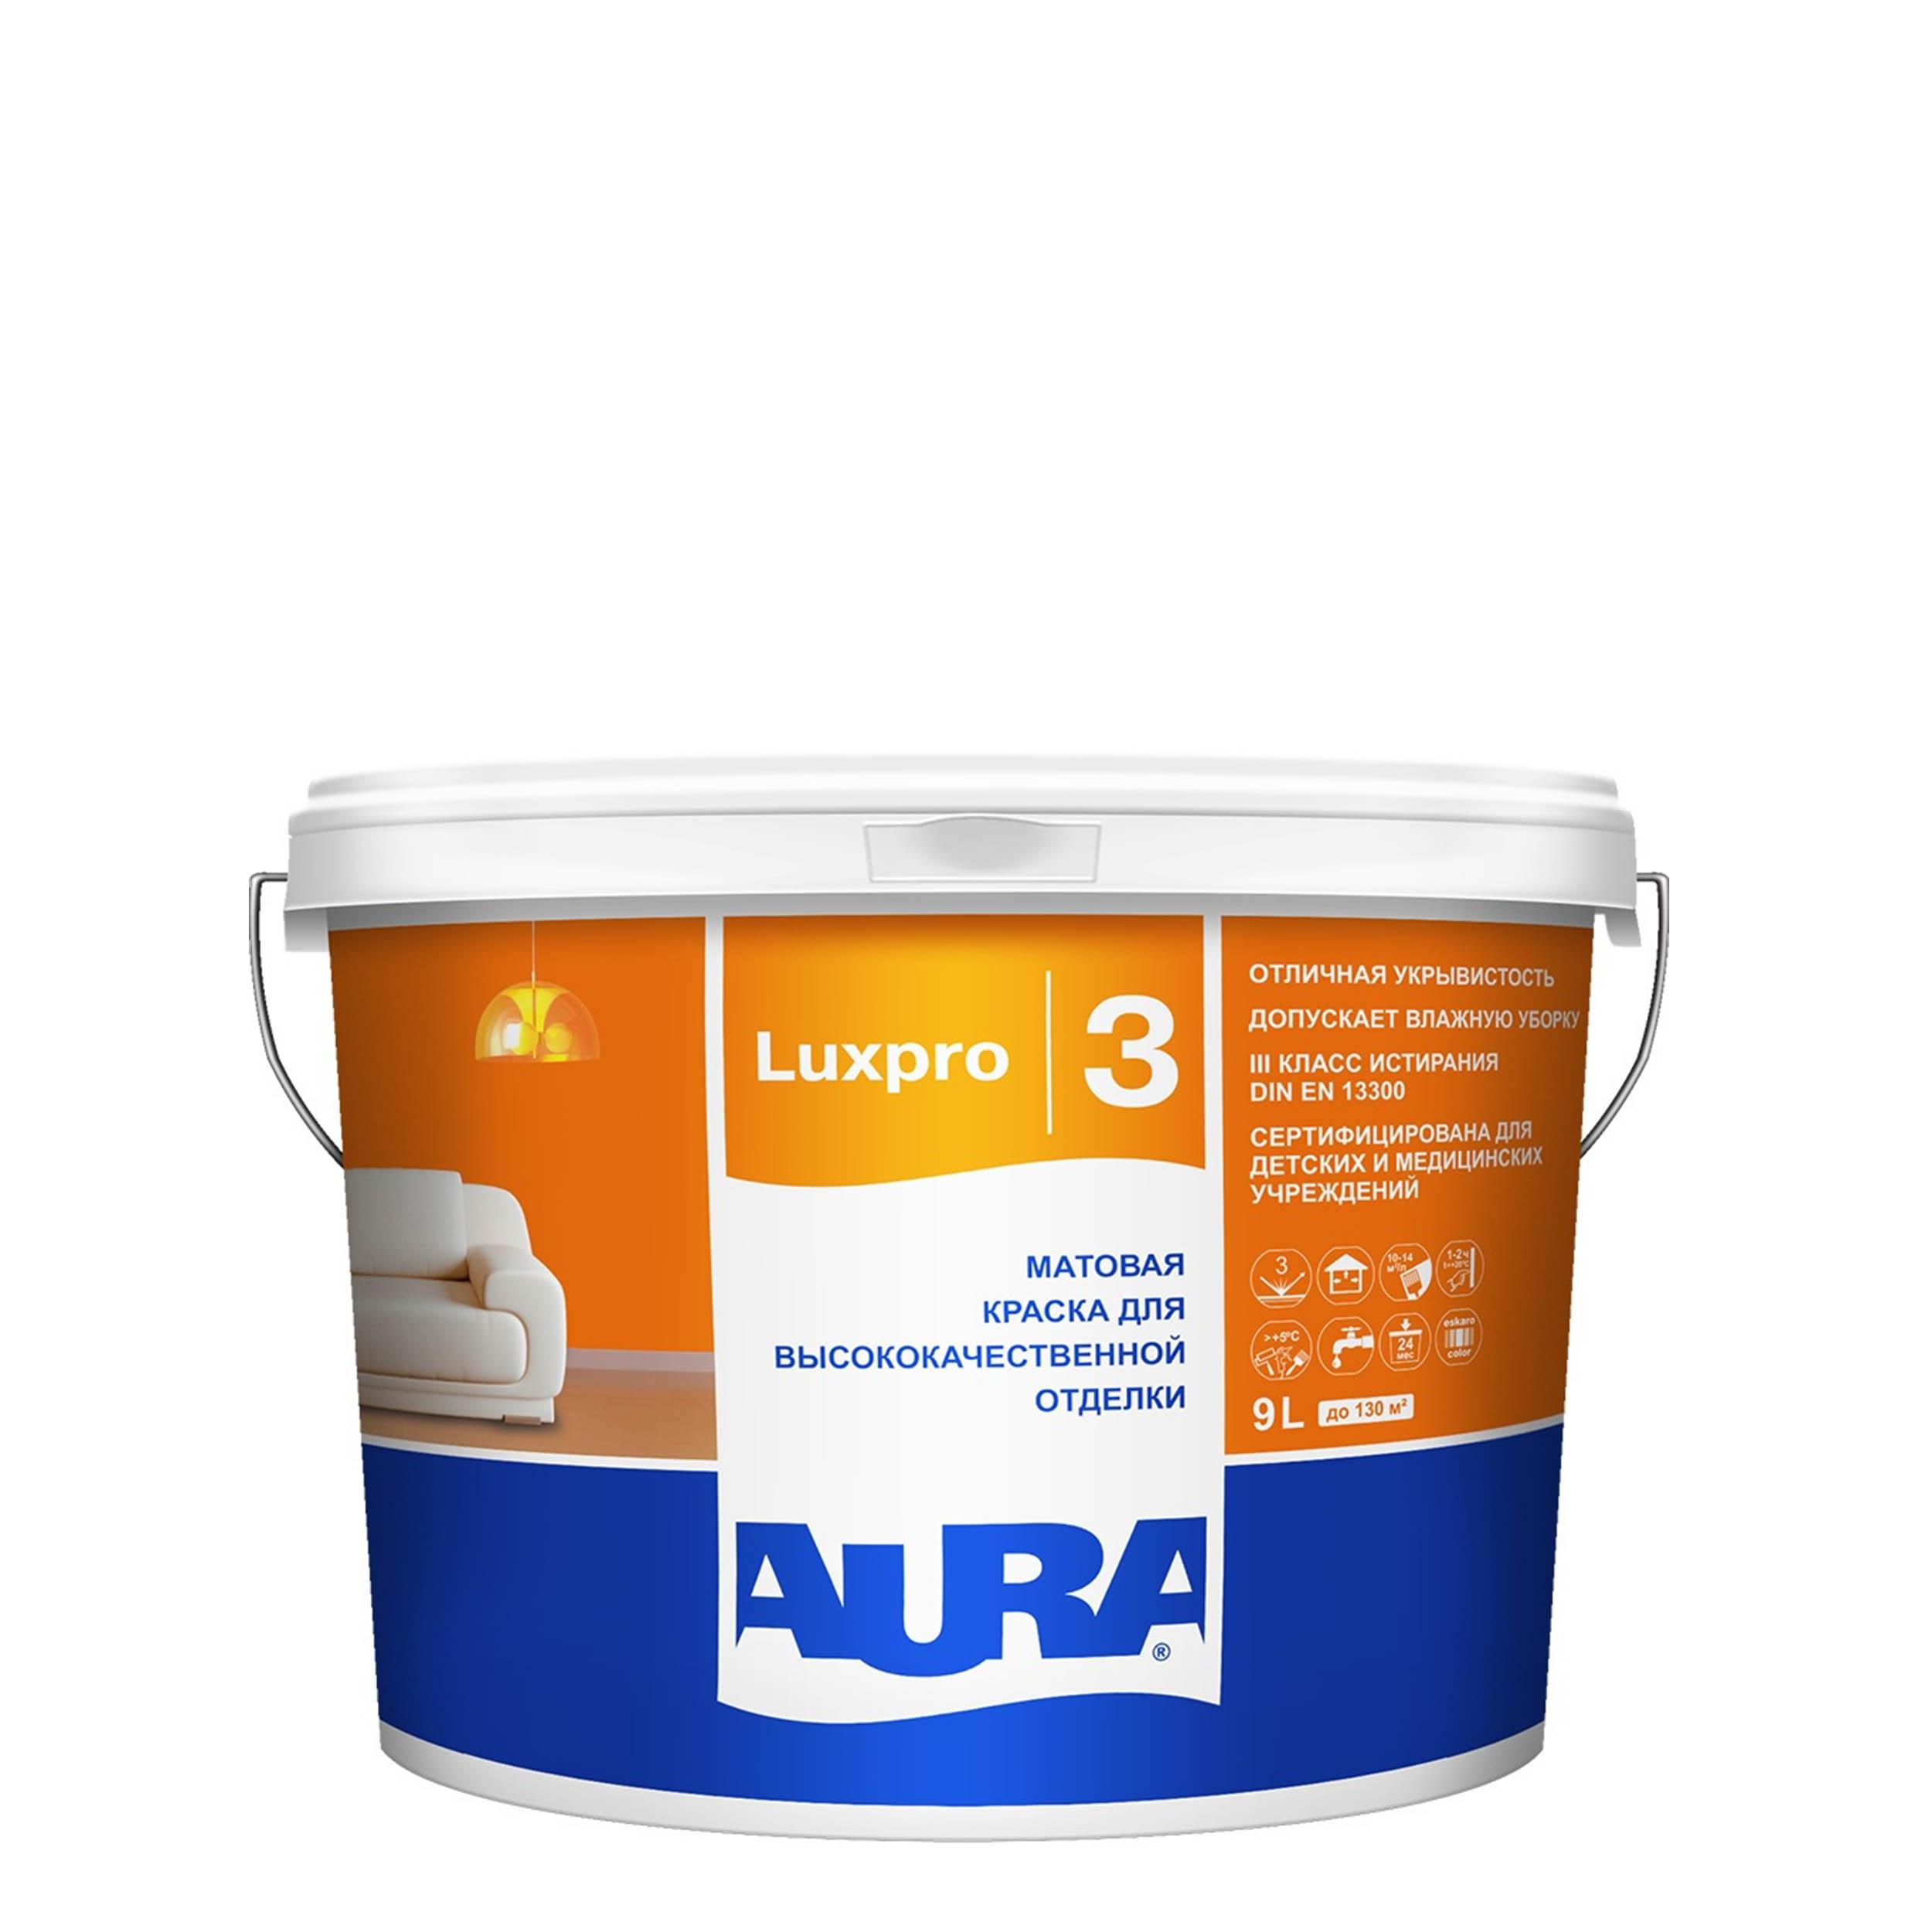 Фото 3 - Краска интерьерная, Aura LuxPRO 3, RAL 5008, 11 кг.